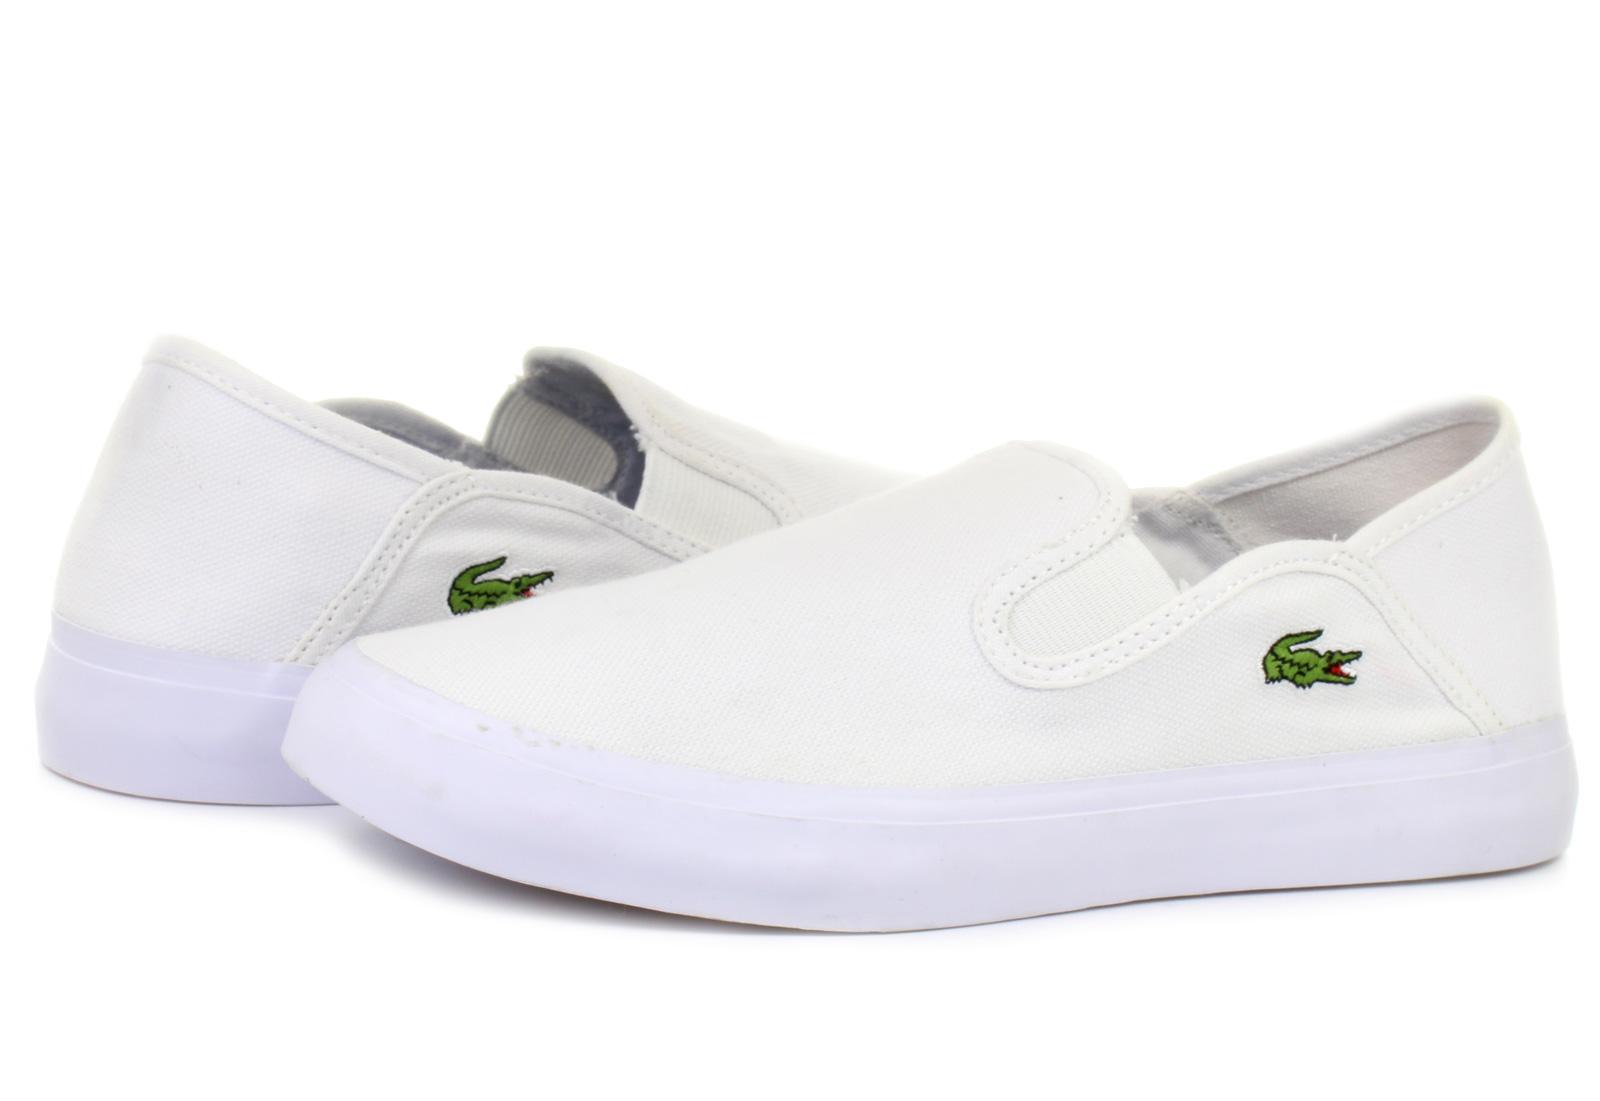 5090ad0240 Lacoste Shoes - Bellevue Slip - 141spw0101-21g - Online shop for ...